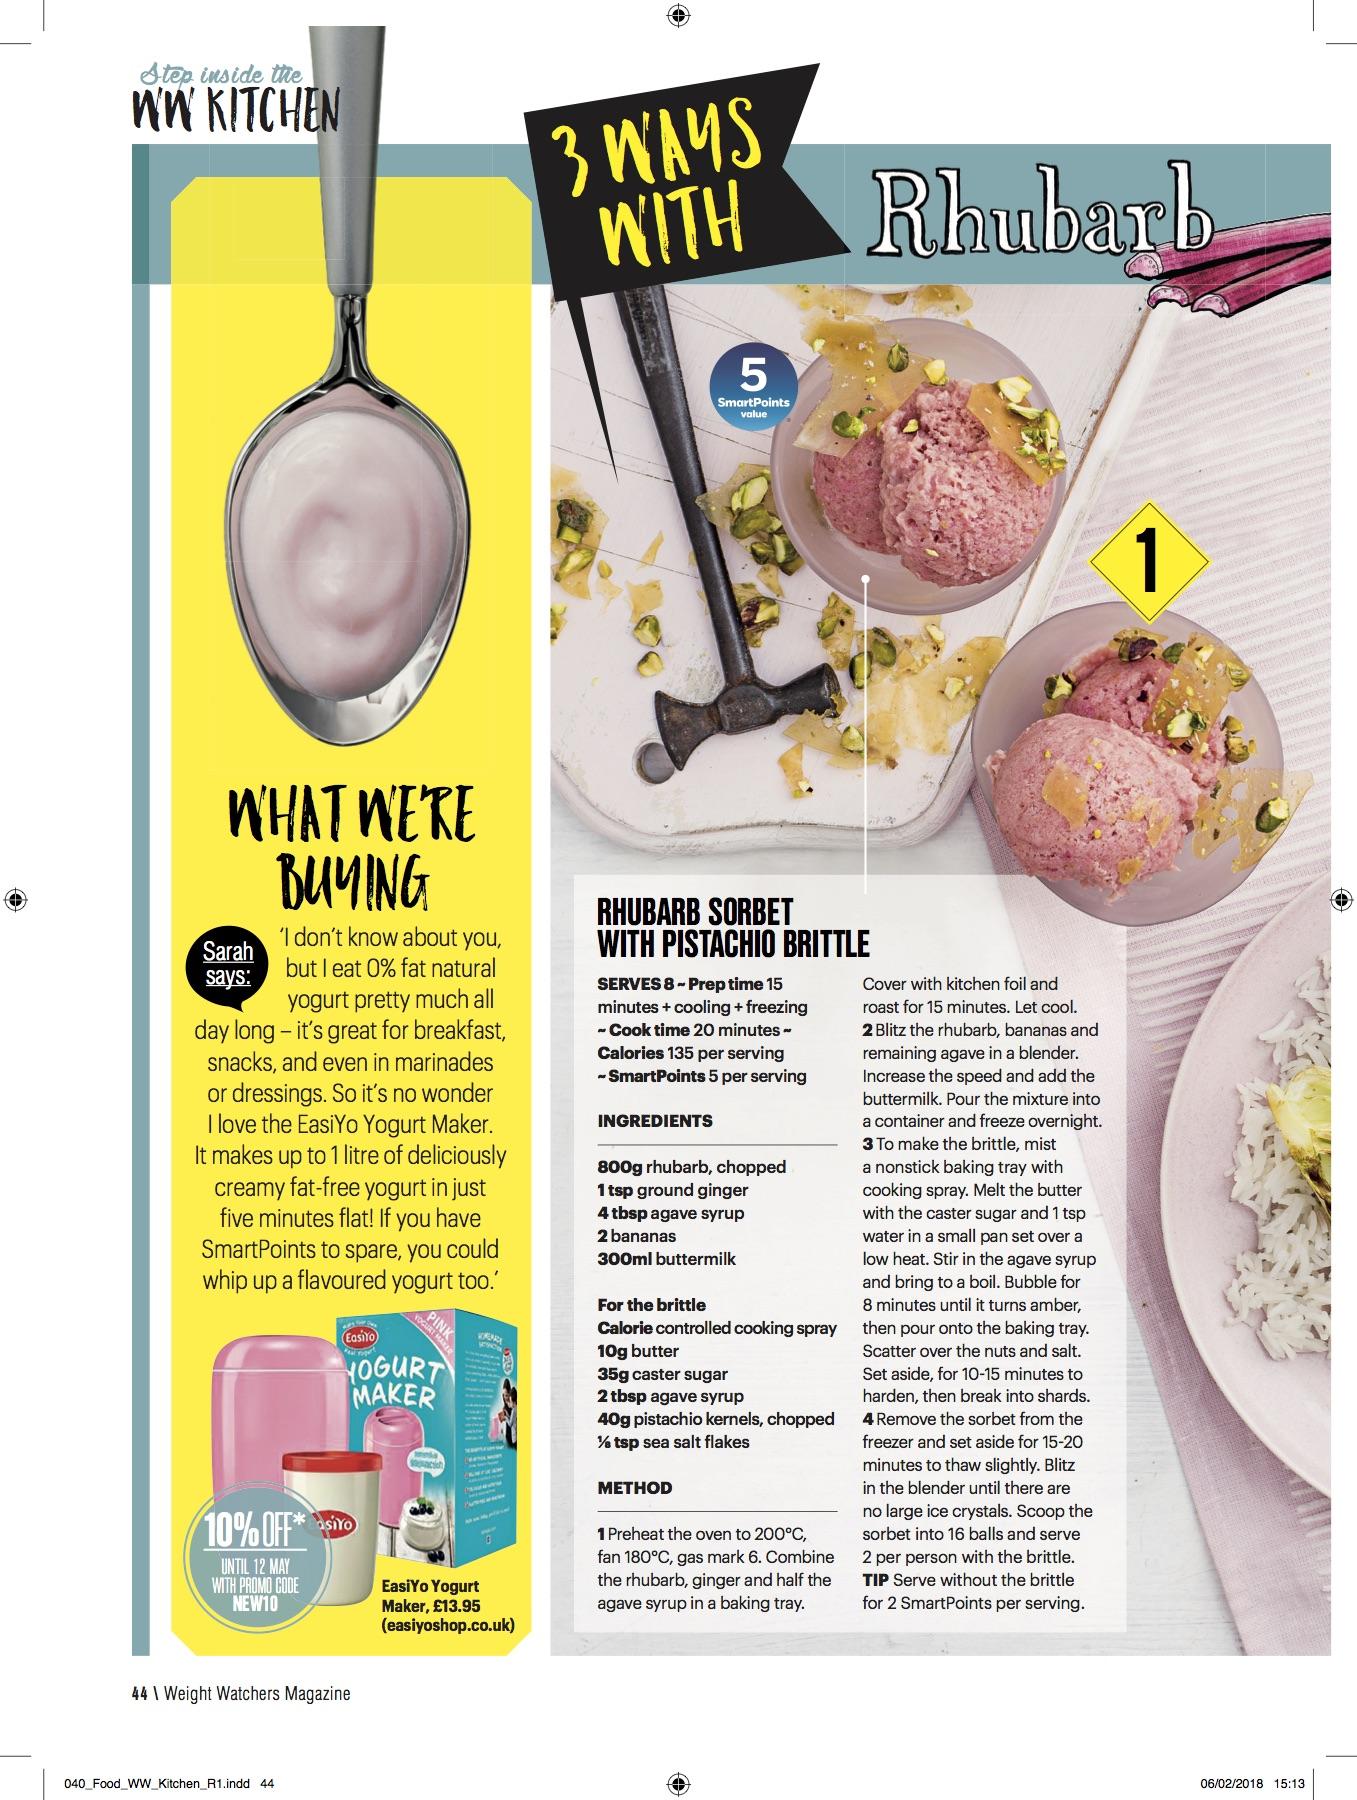 Publication: Weight Watchers magazine April 2018  Photographer: Ant Duncan  Food stylist: Vicky Smallwood  Prop stylist: Tonia Shuttleworth